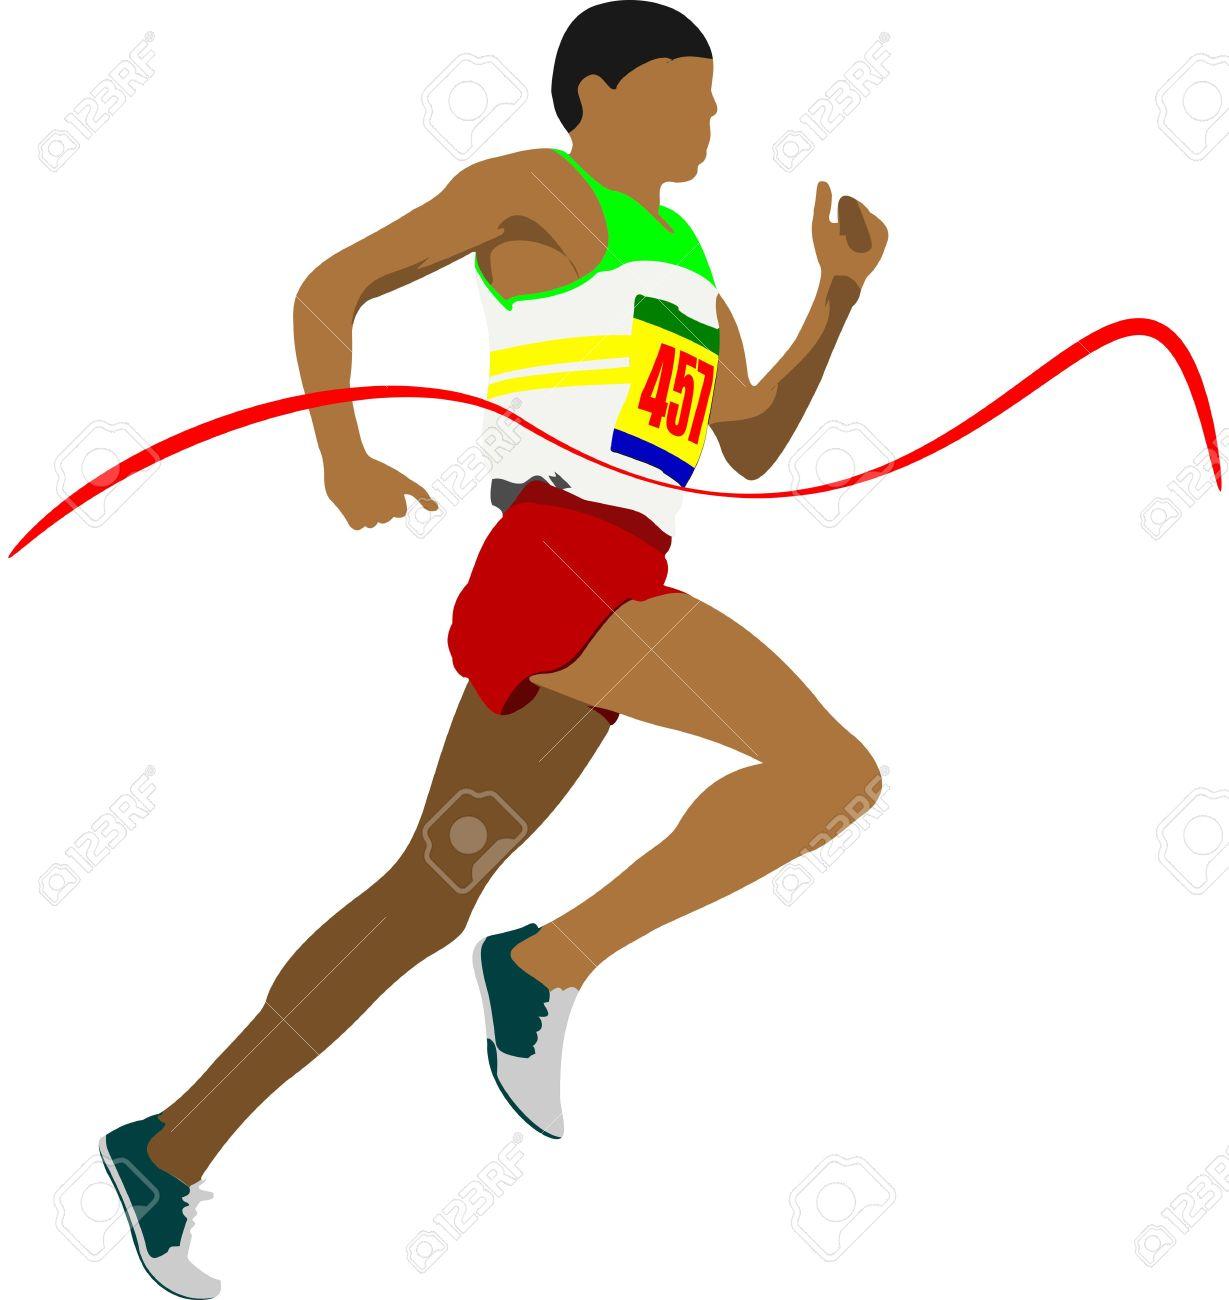 Athletics logo clipart jpg Athletic Clip Art Free | Clipart Panda - Free Clipart Images jpg